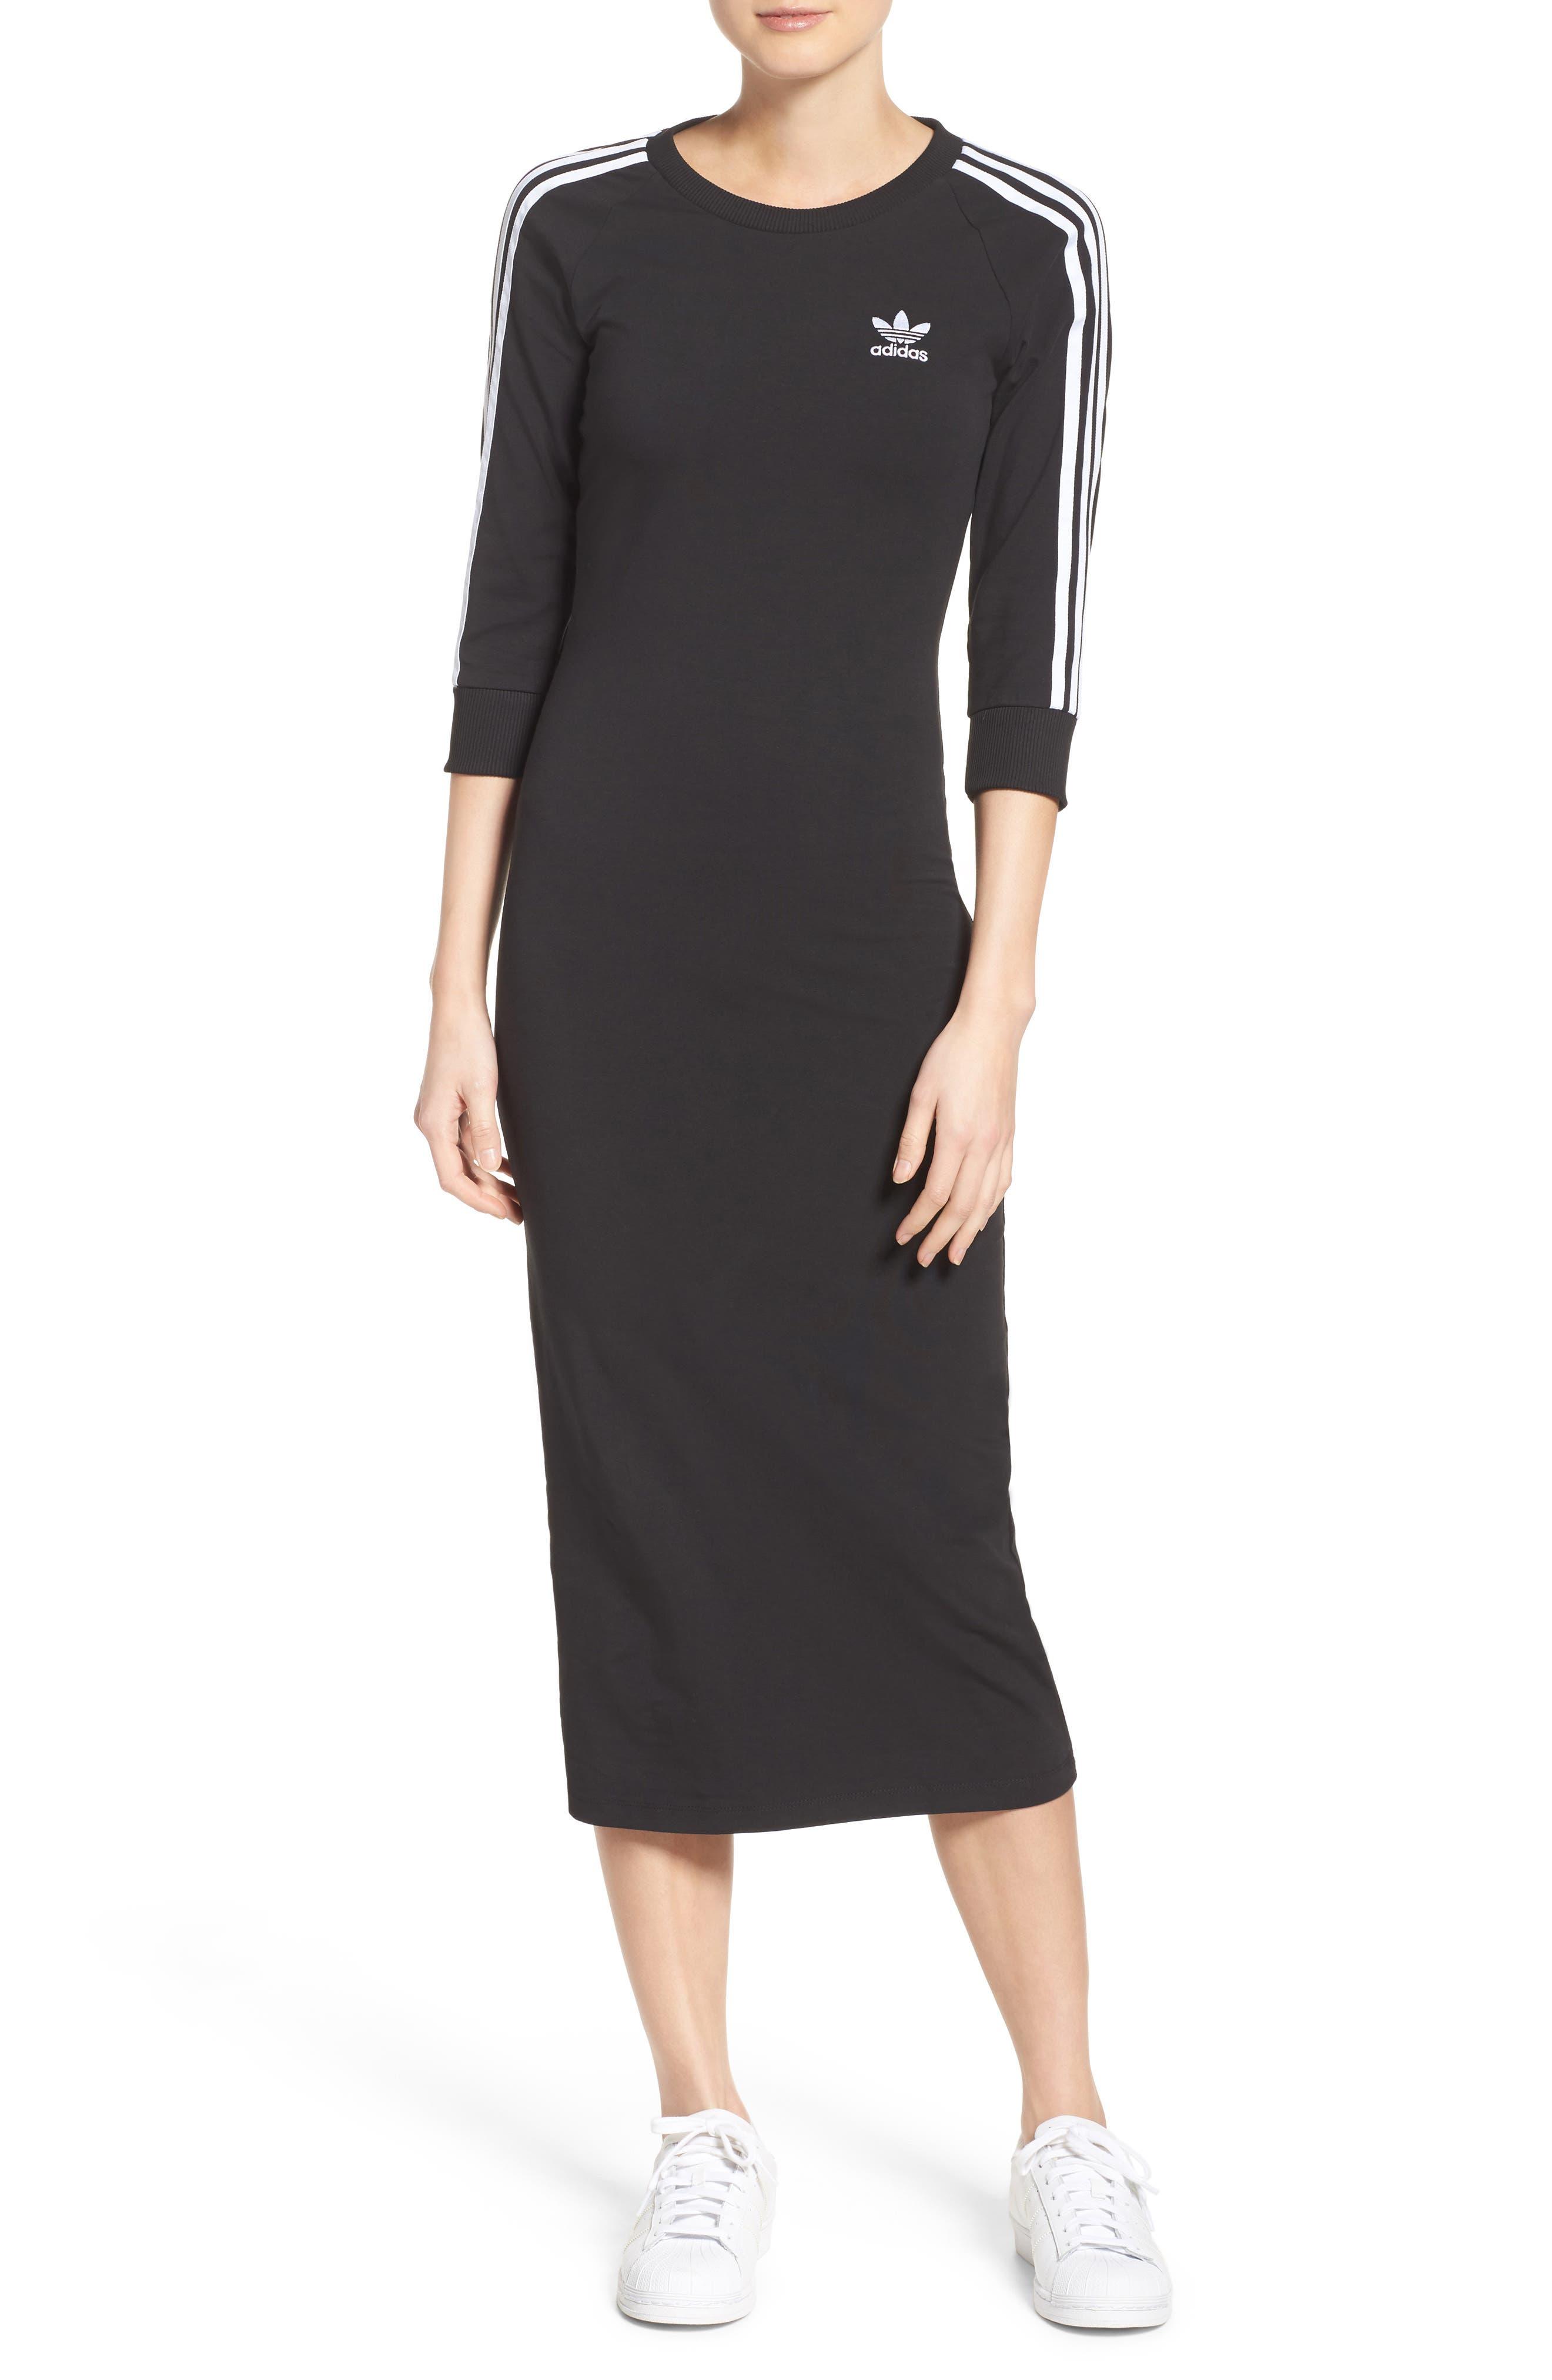 Alternate Image 1 Selected - adidas Originals 3-Stripes Dress